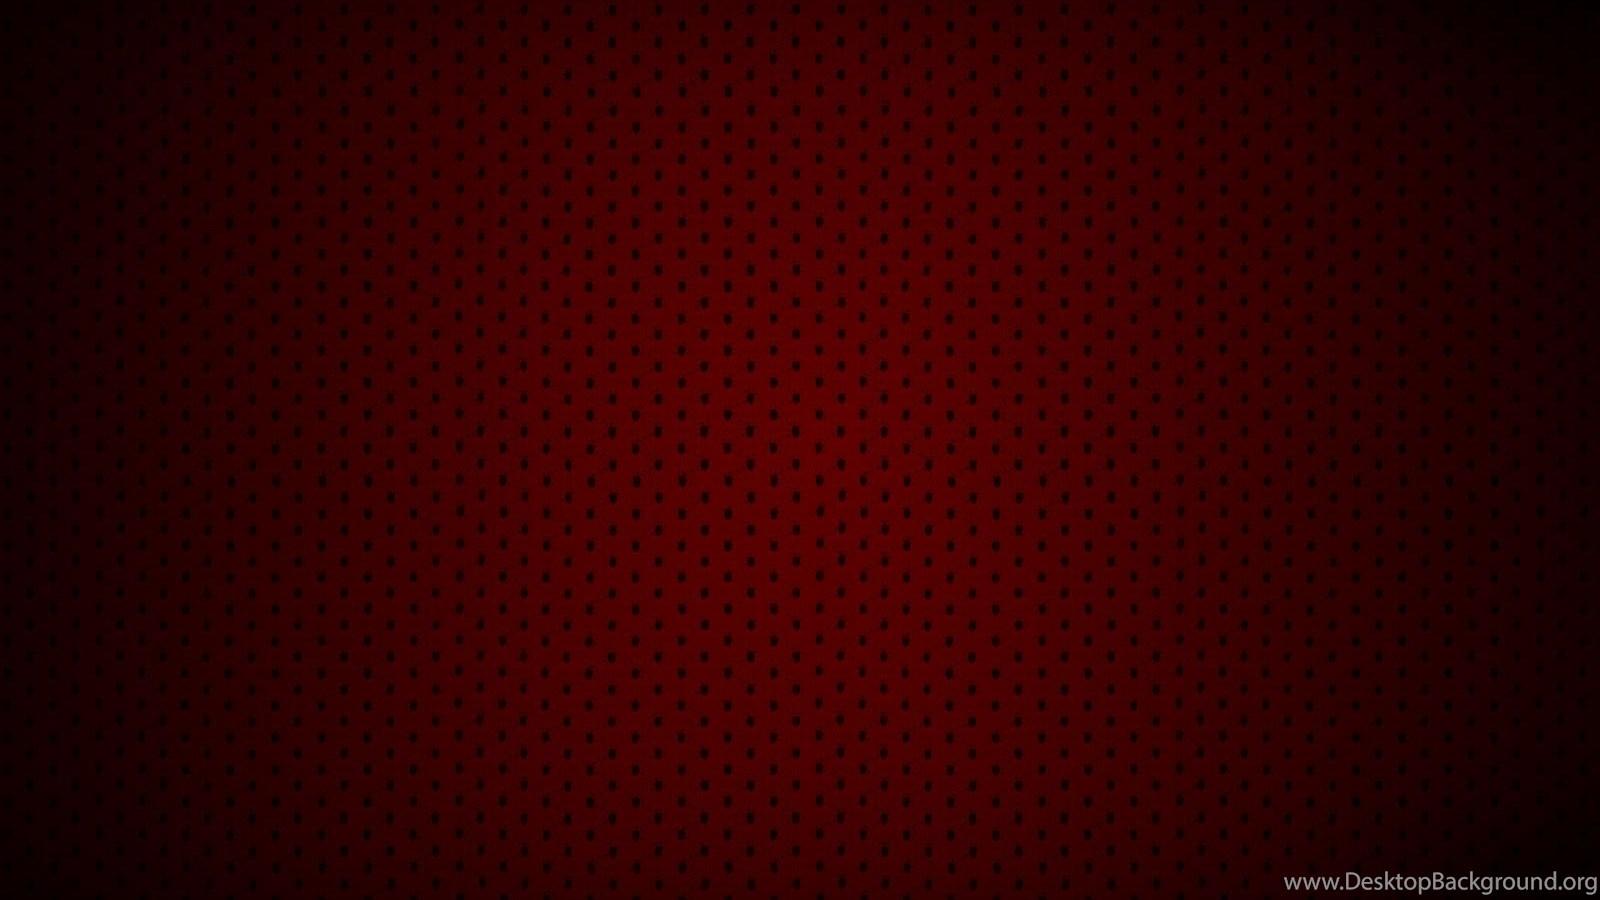 Burgundy wallpapers hd wallpapers lovely desktop background for Burgundy wallpaper